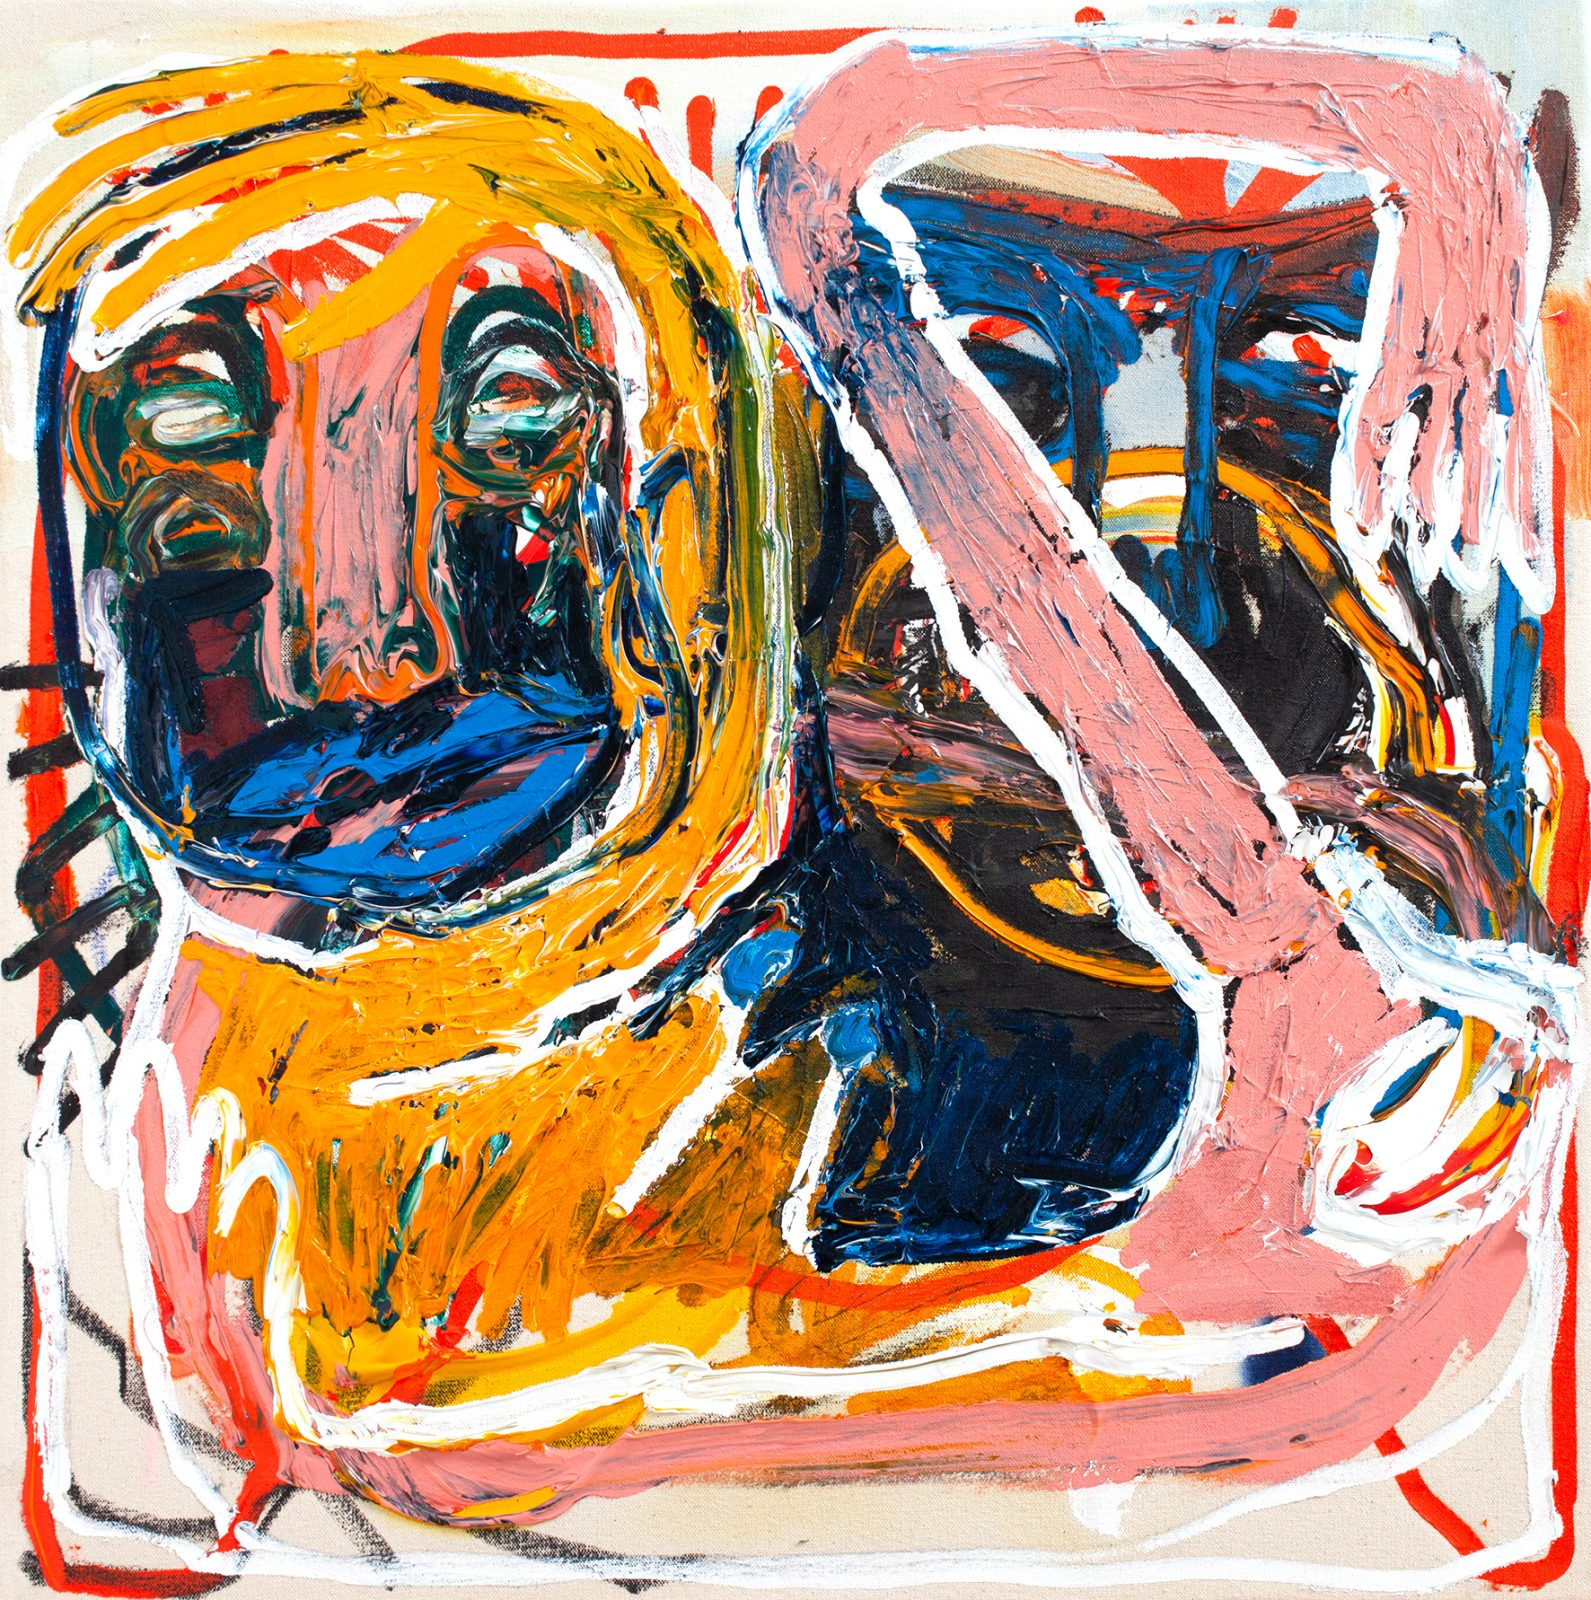 NÖ Waldviertel Galerie Kunst - Denise Rudolf Frank